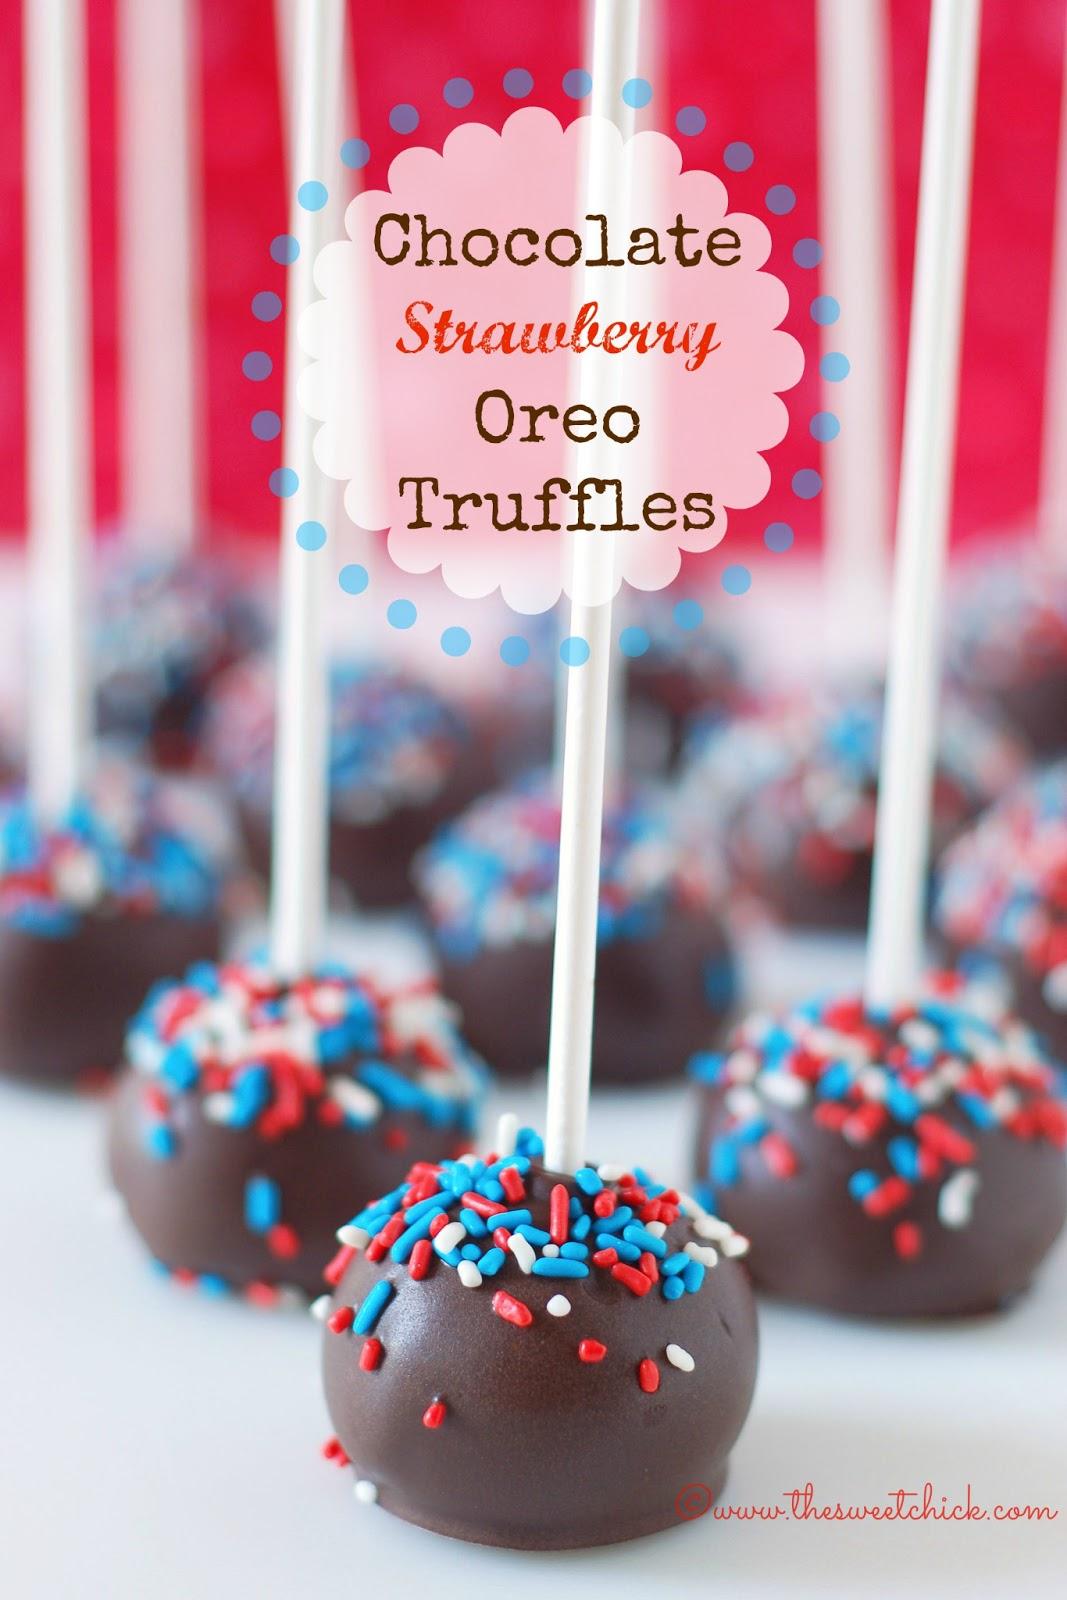 The Sweet Chick Chocolate Strawberry Oreo Truffles